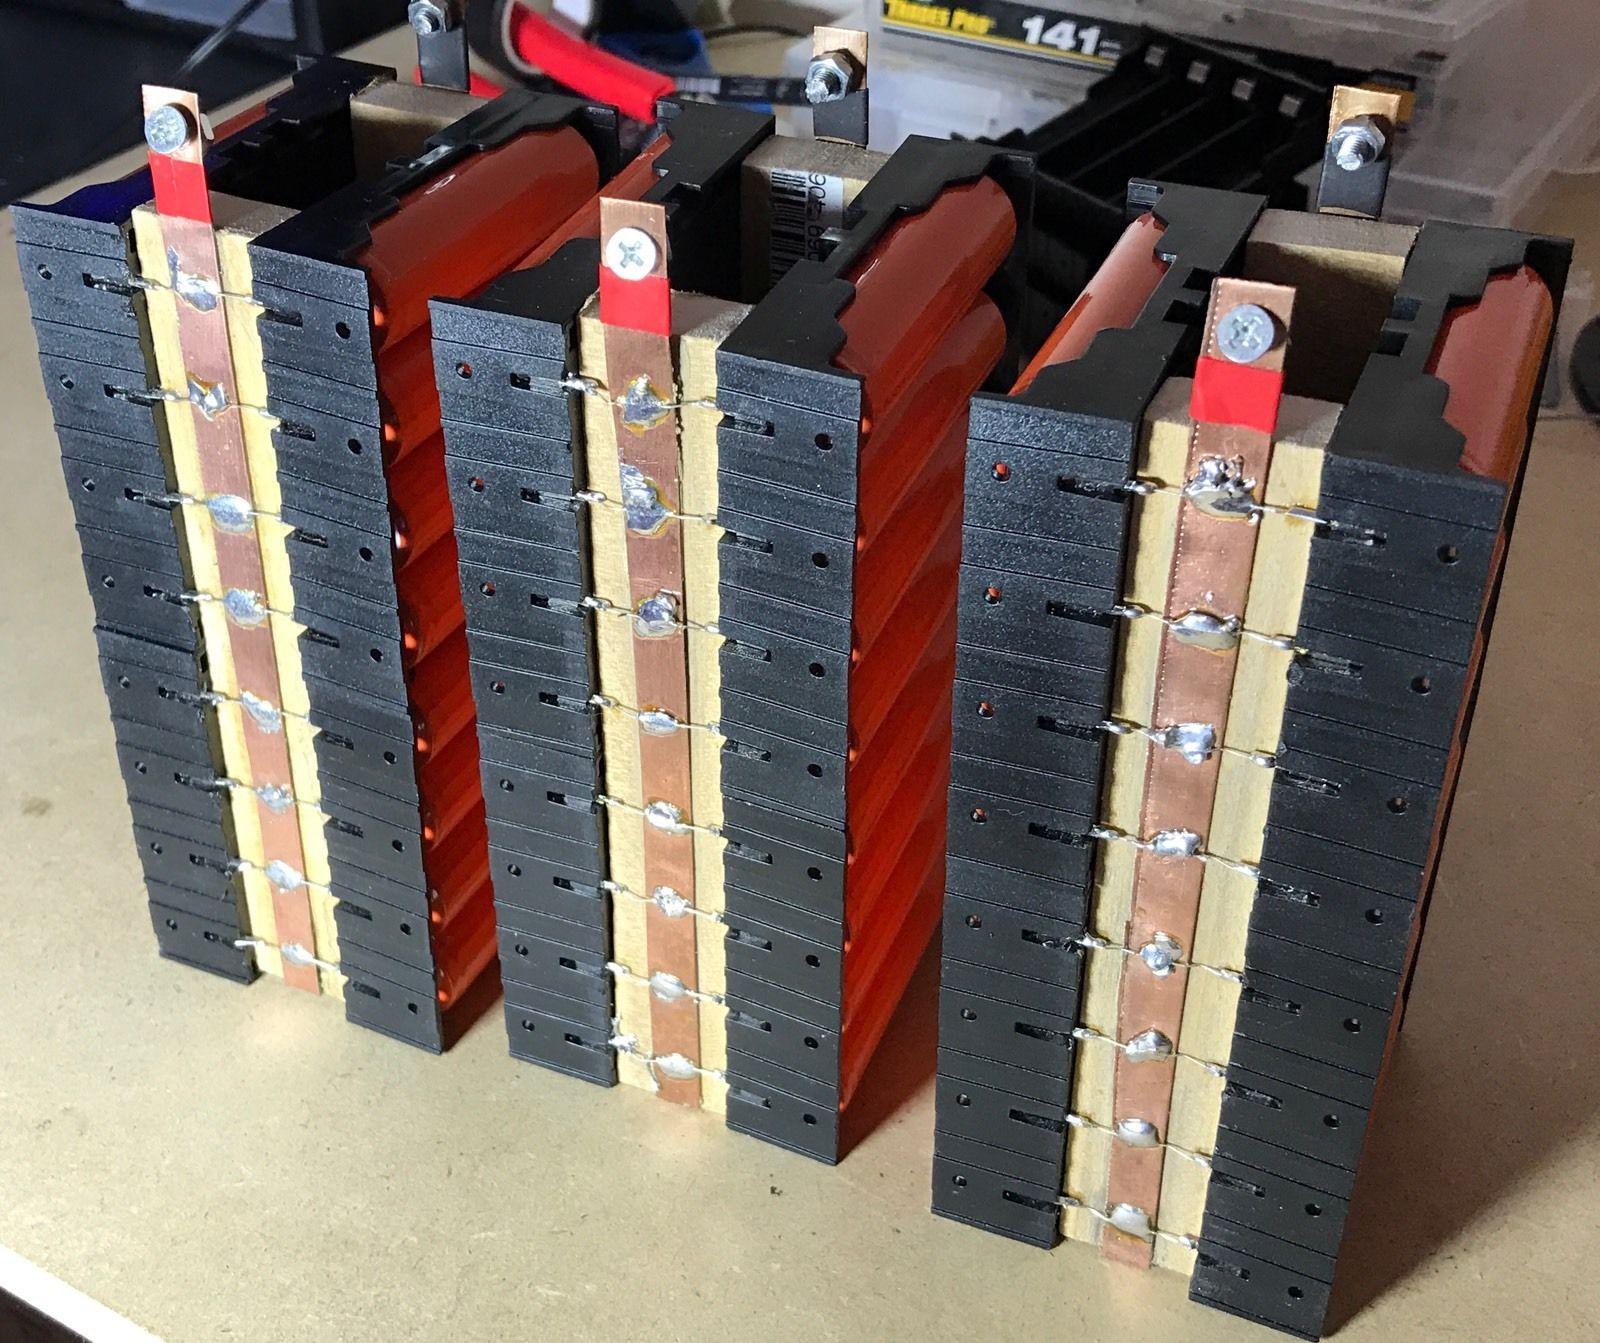 Lot of 18650 batteriesdiy powerwalllipolithium ion48 cells 42 lot of 18650 batteriesdiy powerwalllipolithium ion48 cells 42v 1800mah solutioingenieria Images